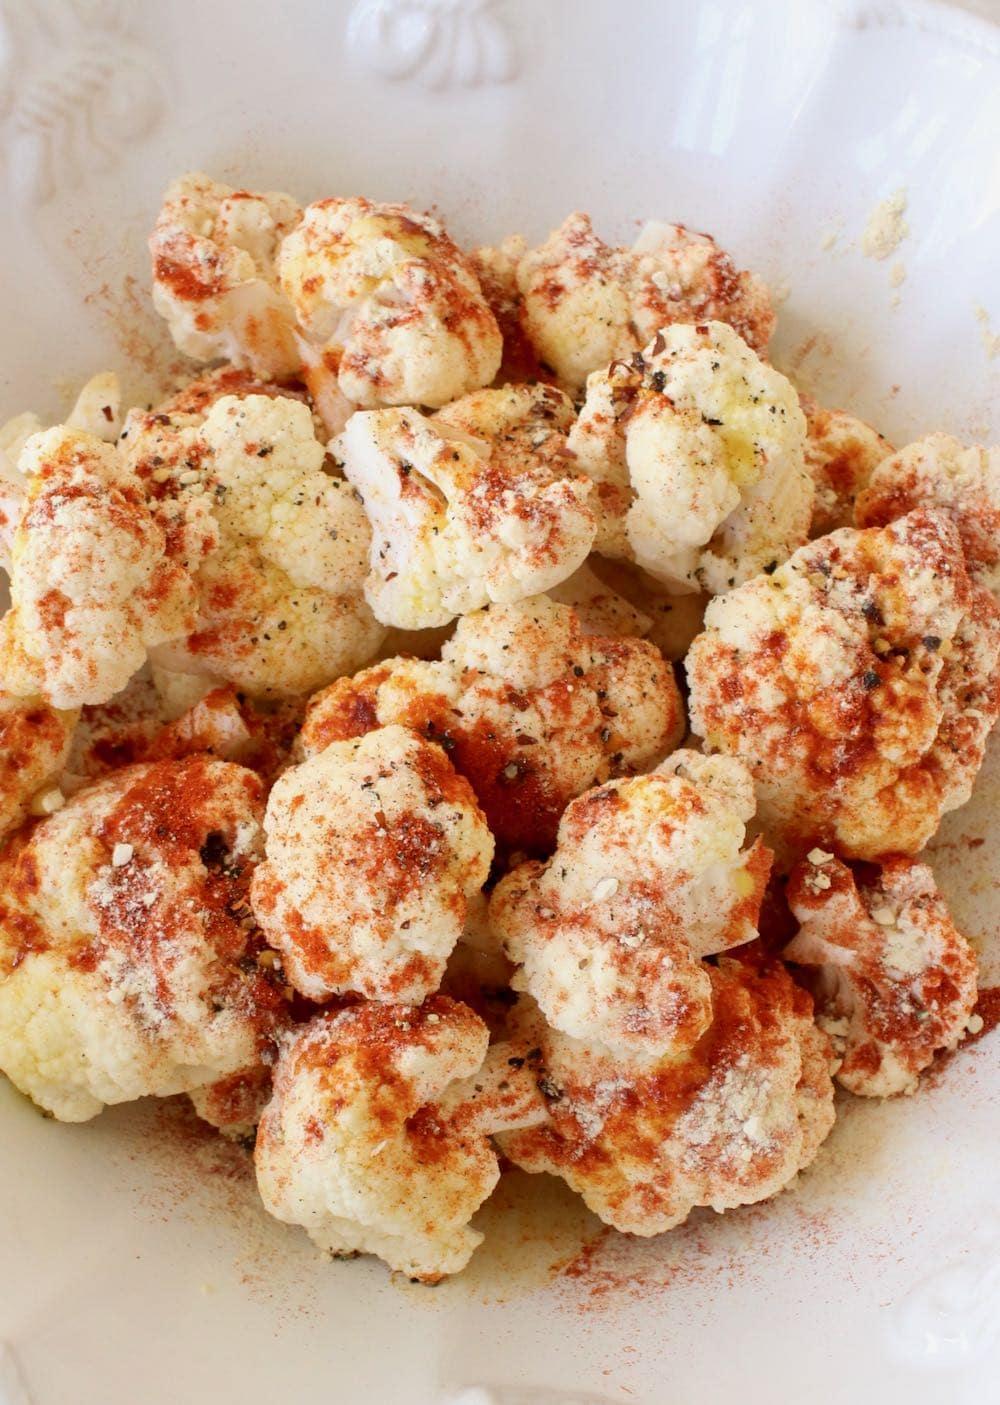 Cauliflower florets for air frying